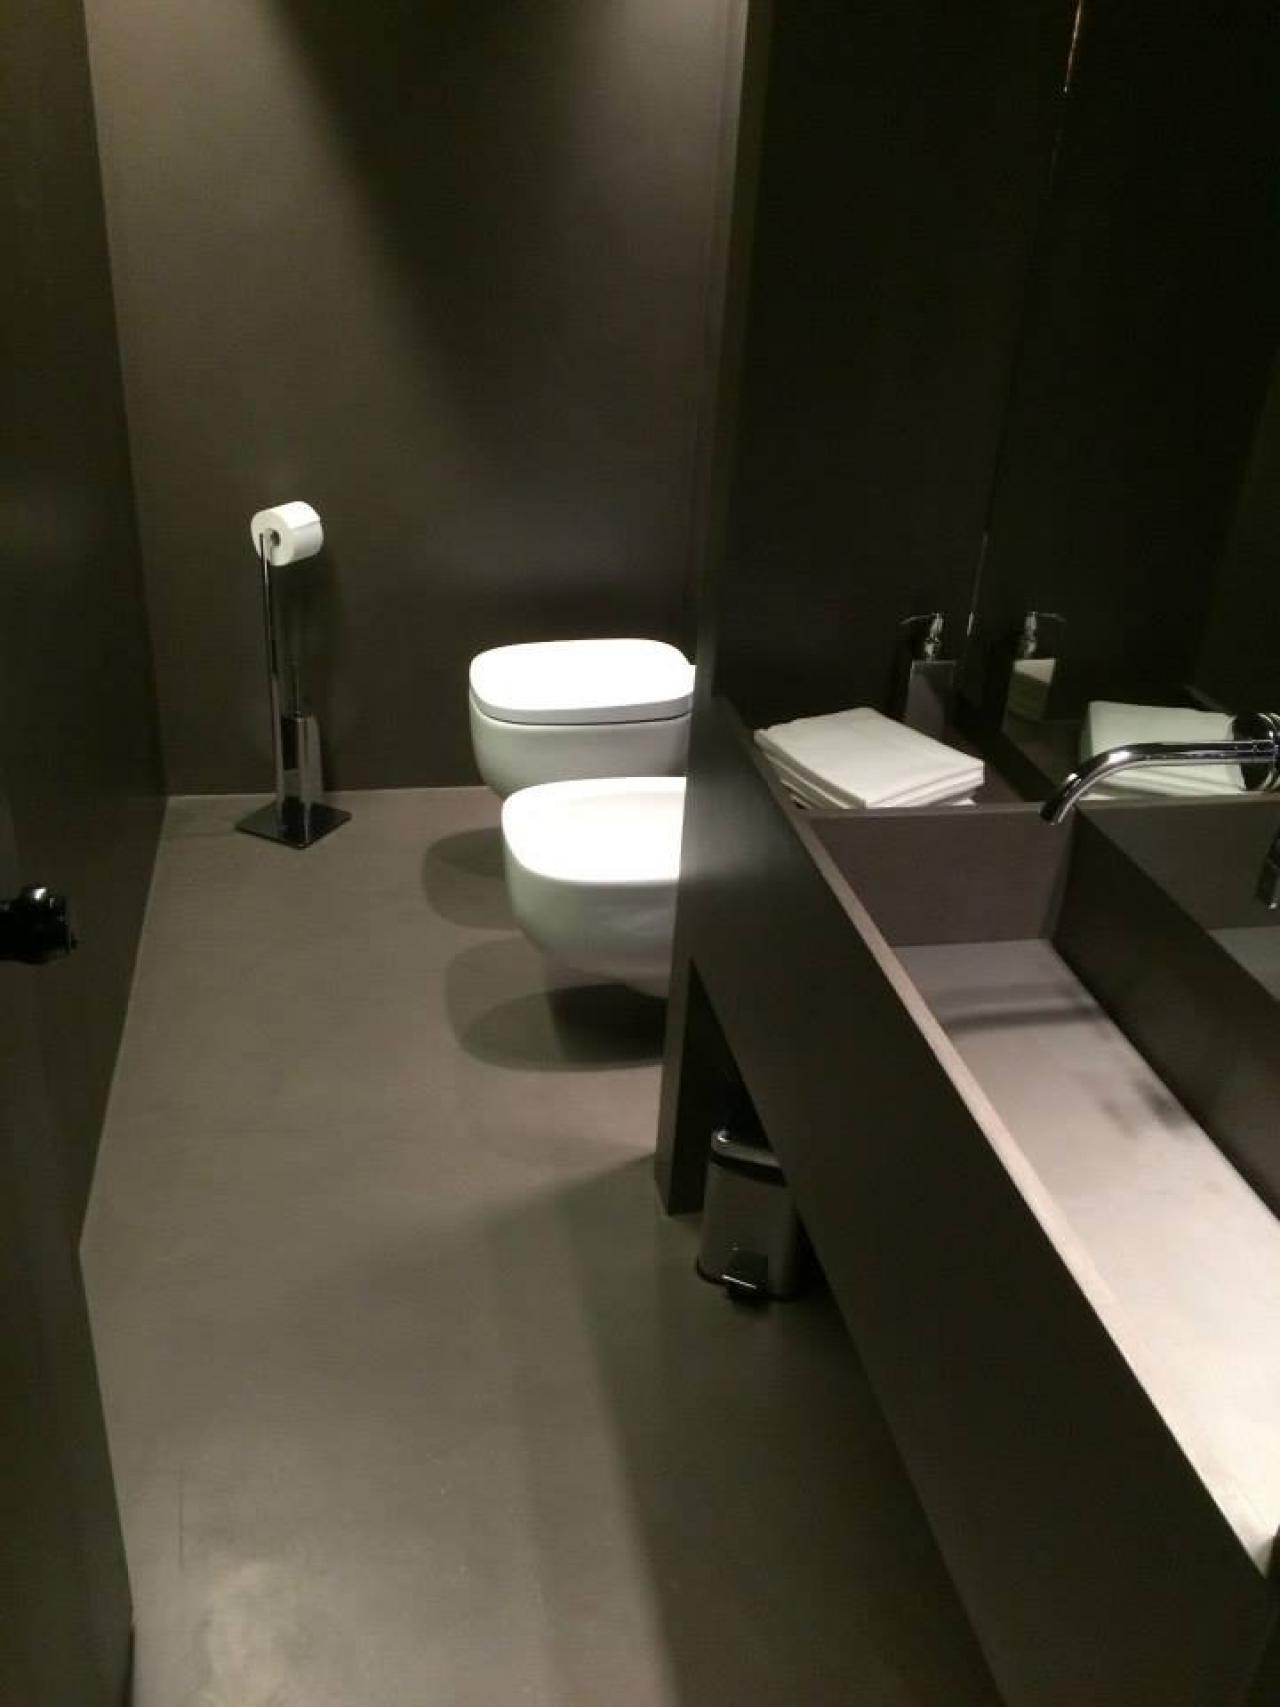 Resina kerakoll per pavimenti e rivestimenti a vicenza - Resina in bagno ...